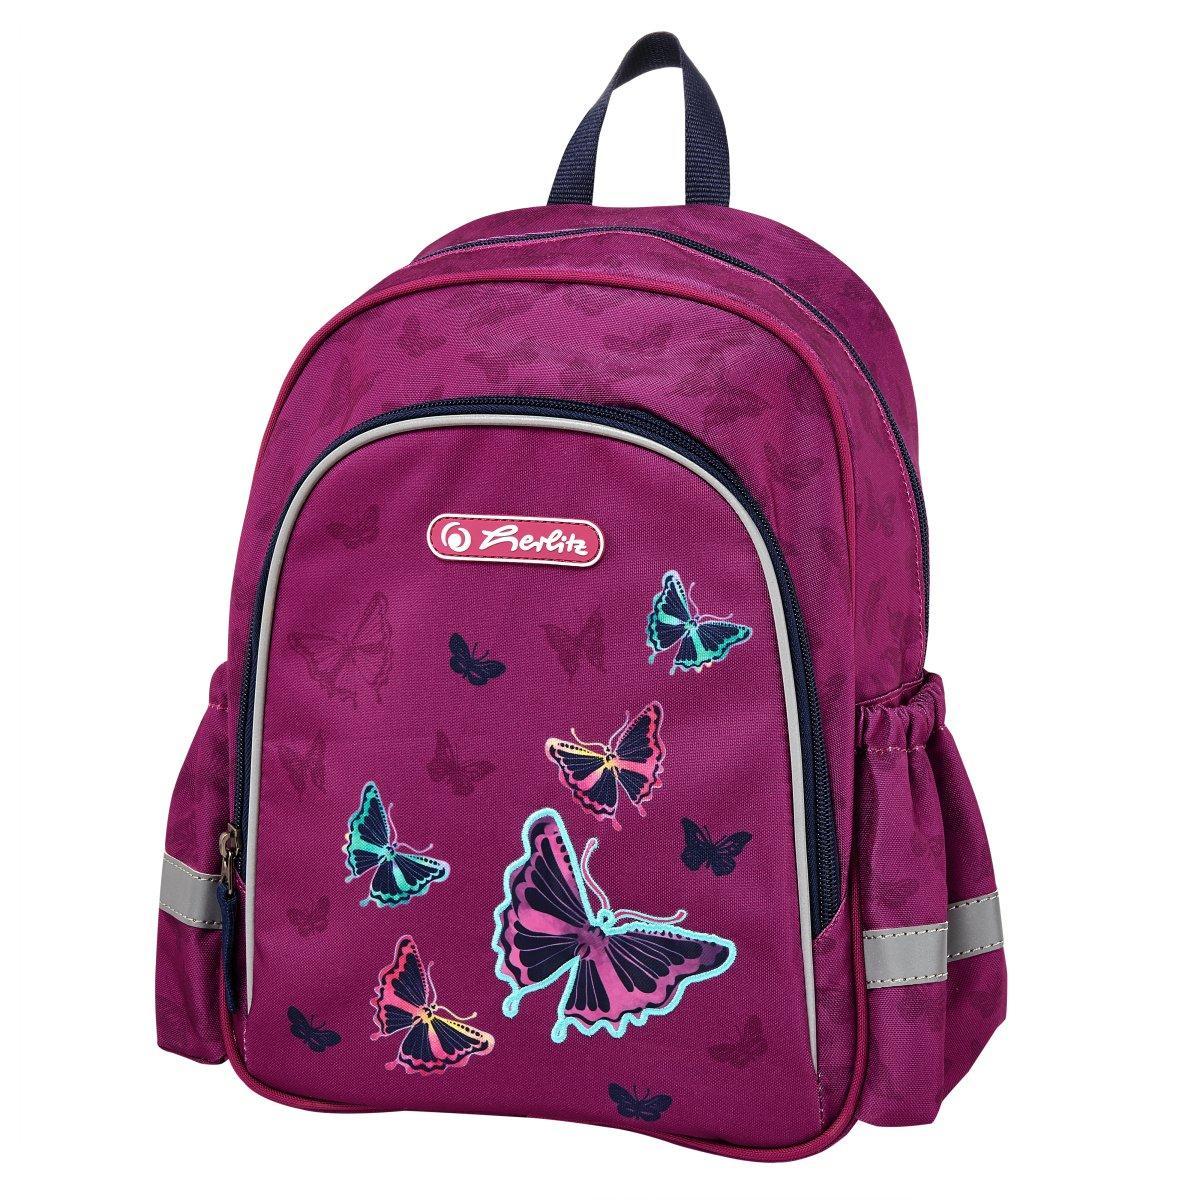 Рюкзак детский Herlitz Kids' Butterfly Бабочки (50020683)